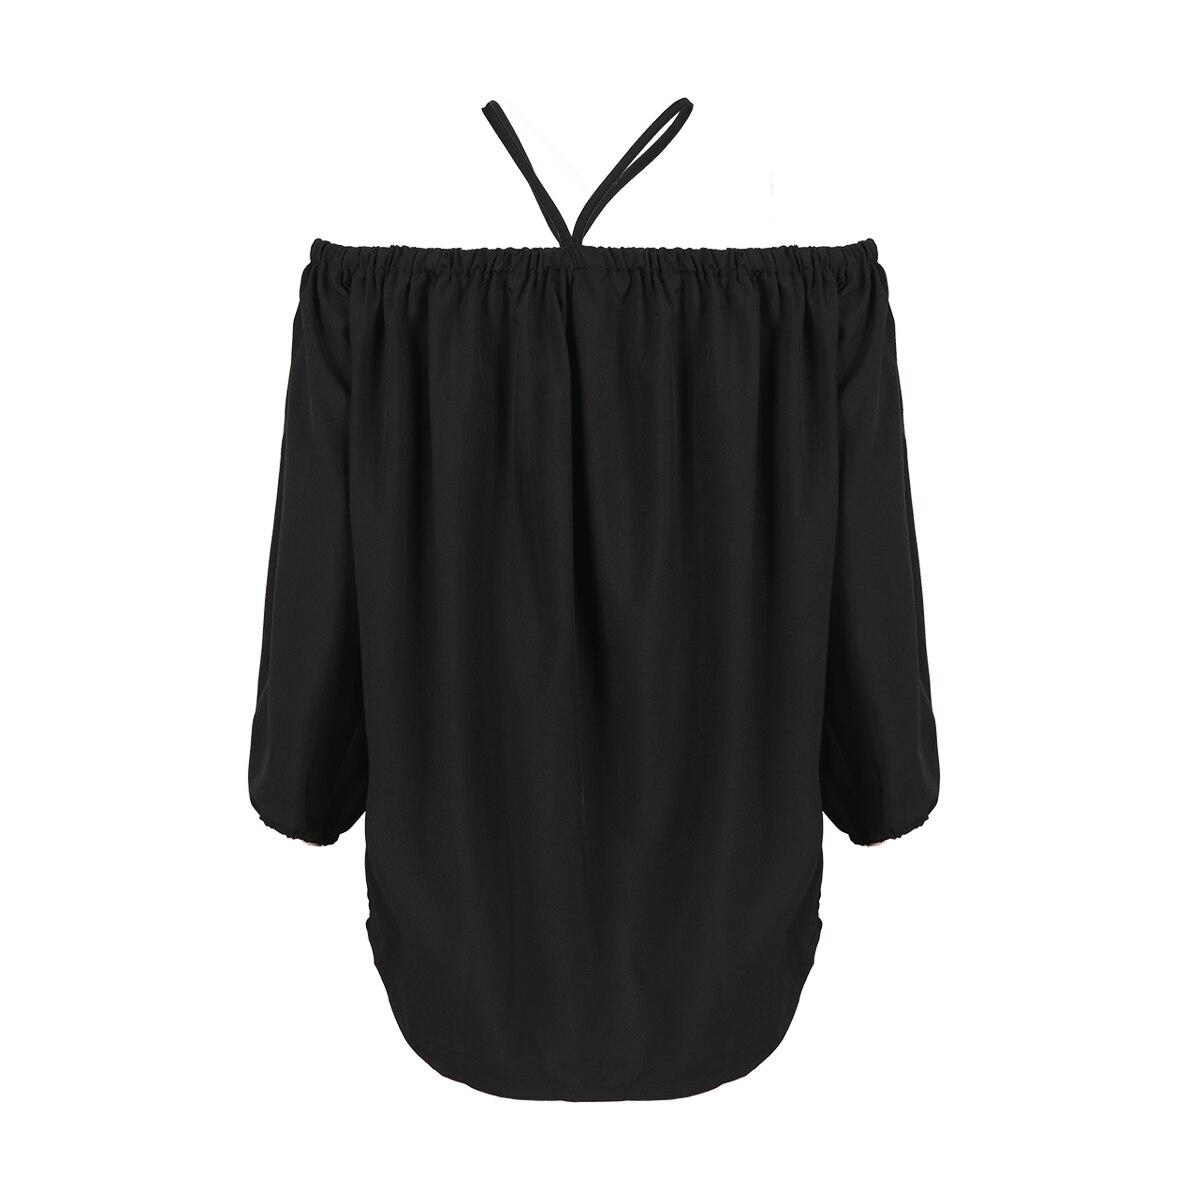 MCO 2017 Autumn Sexy Off Shoulder Plus Size Bardot Top Casual Oversized Halter Strap Shirt Basic Big Women Clothing 5xl 6xl 7xl 1